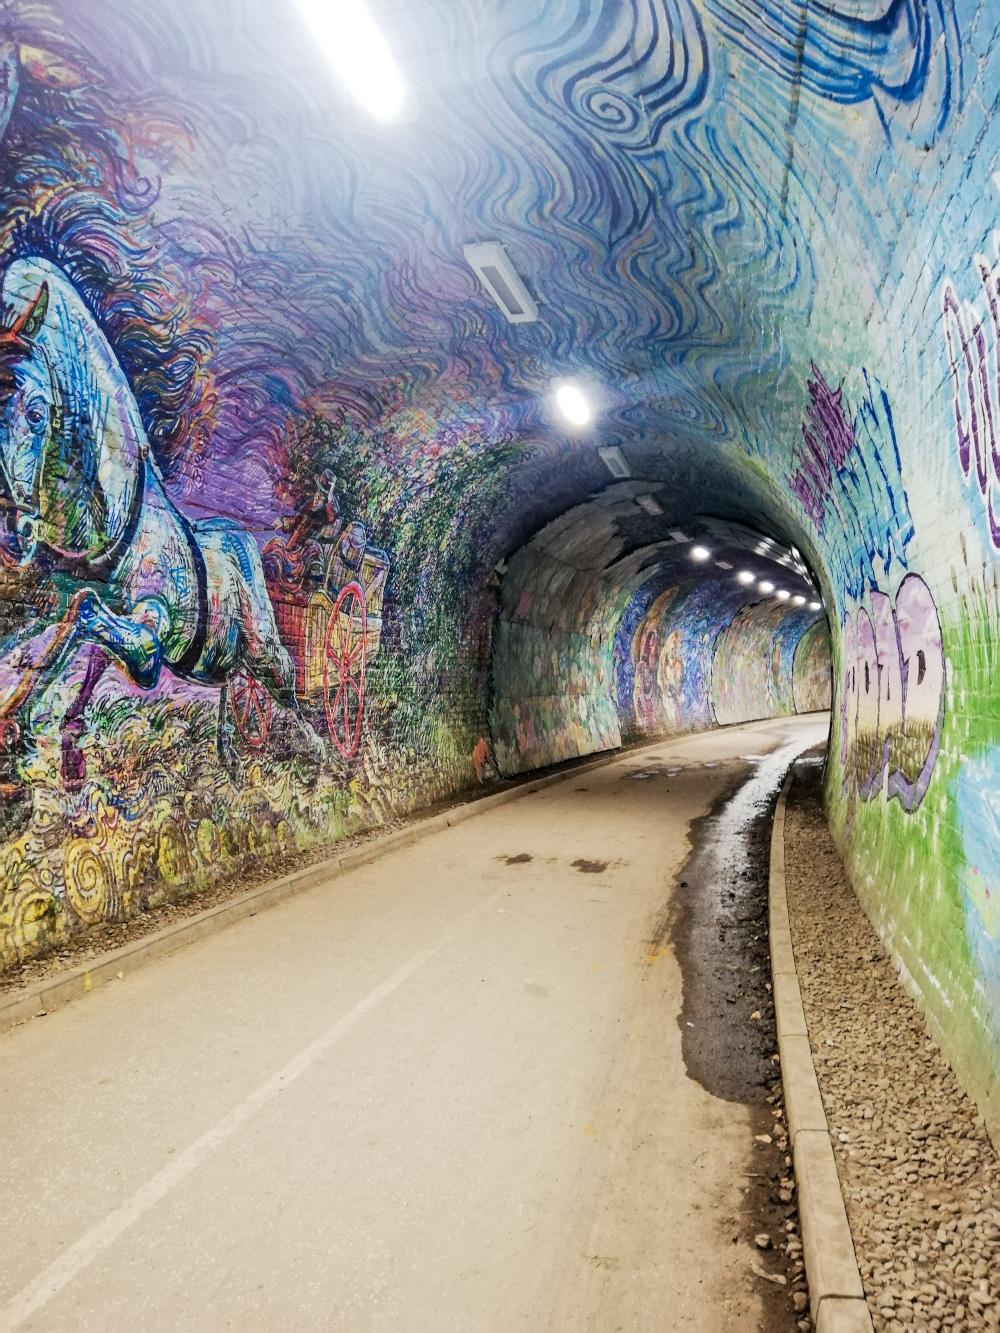 Colinton Tunnel, Edimbourg